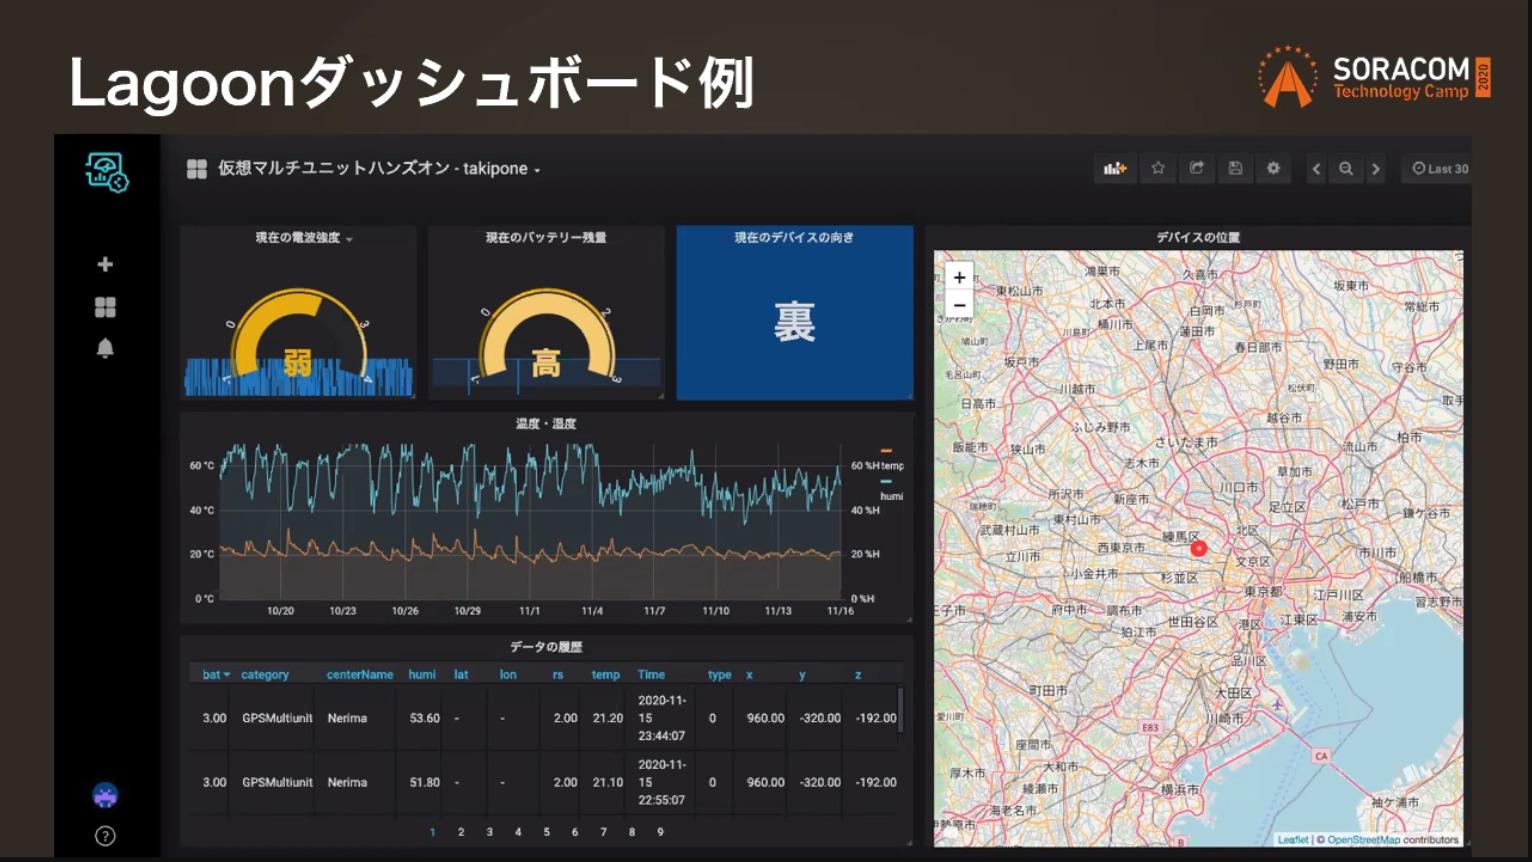 soracom-tech-camp-day1-visualization-09